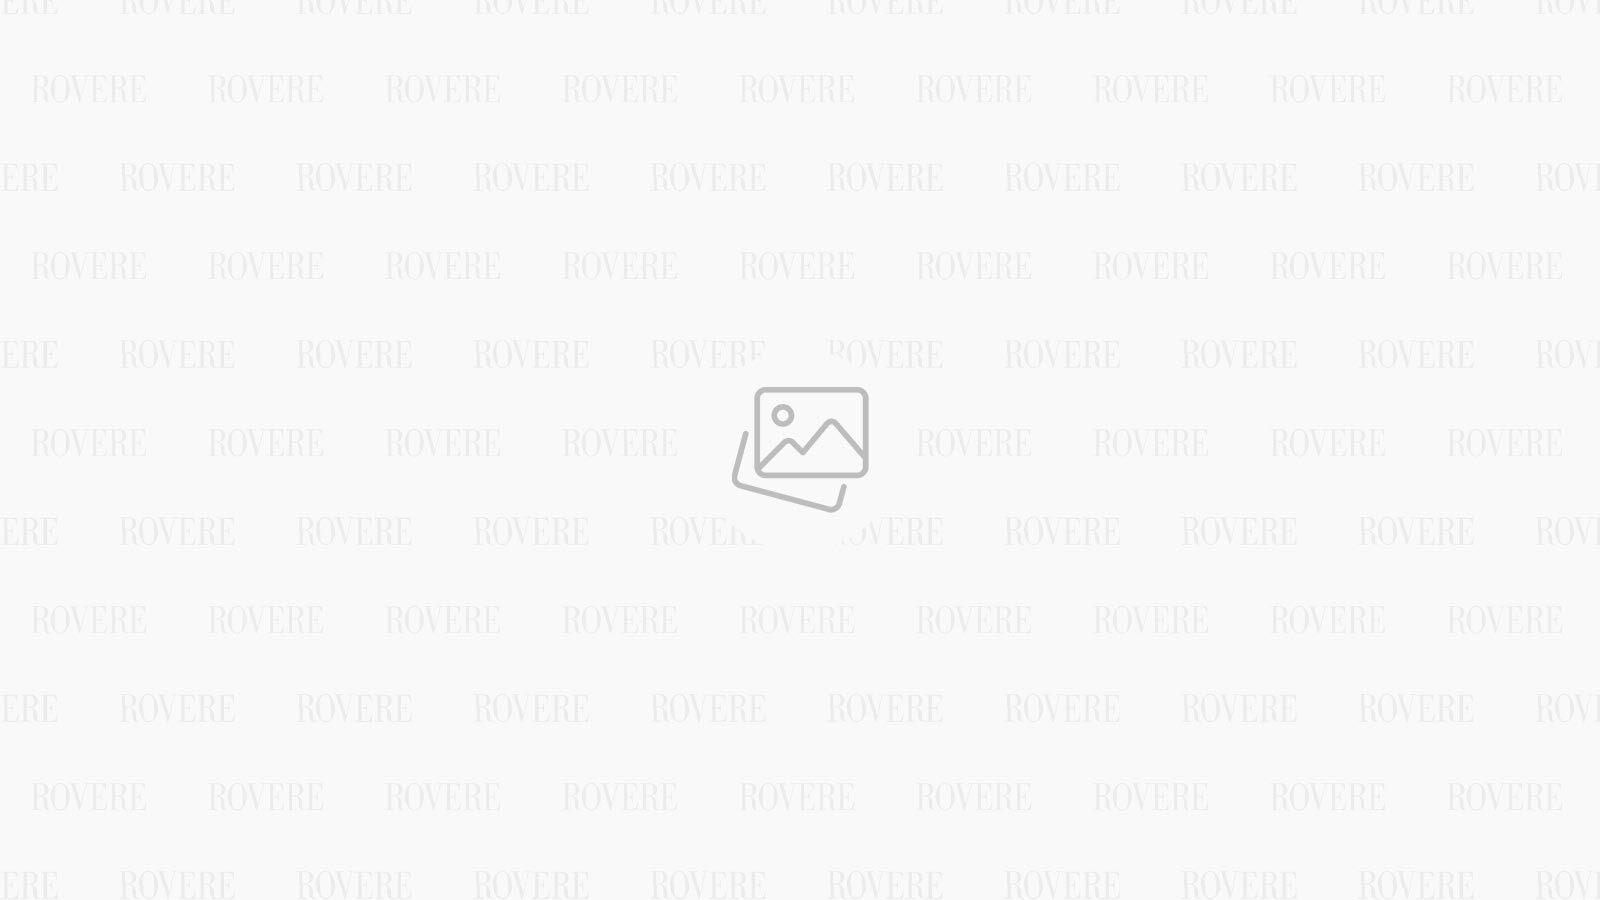 Canapea de colt cu sezlong Calini piele Cerato Dark Brown Vintage, stanga